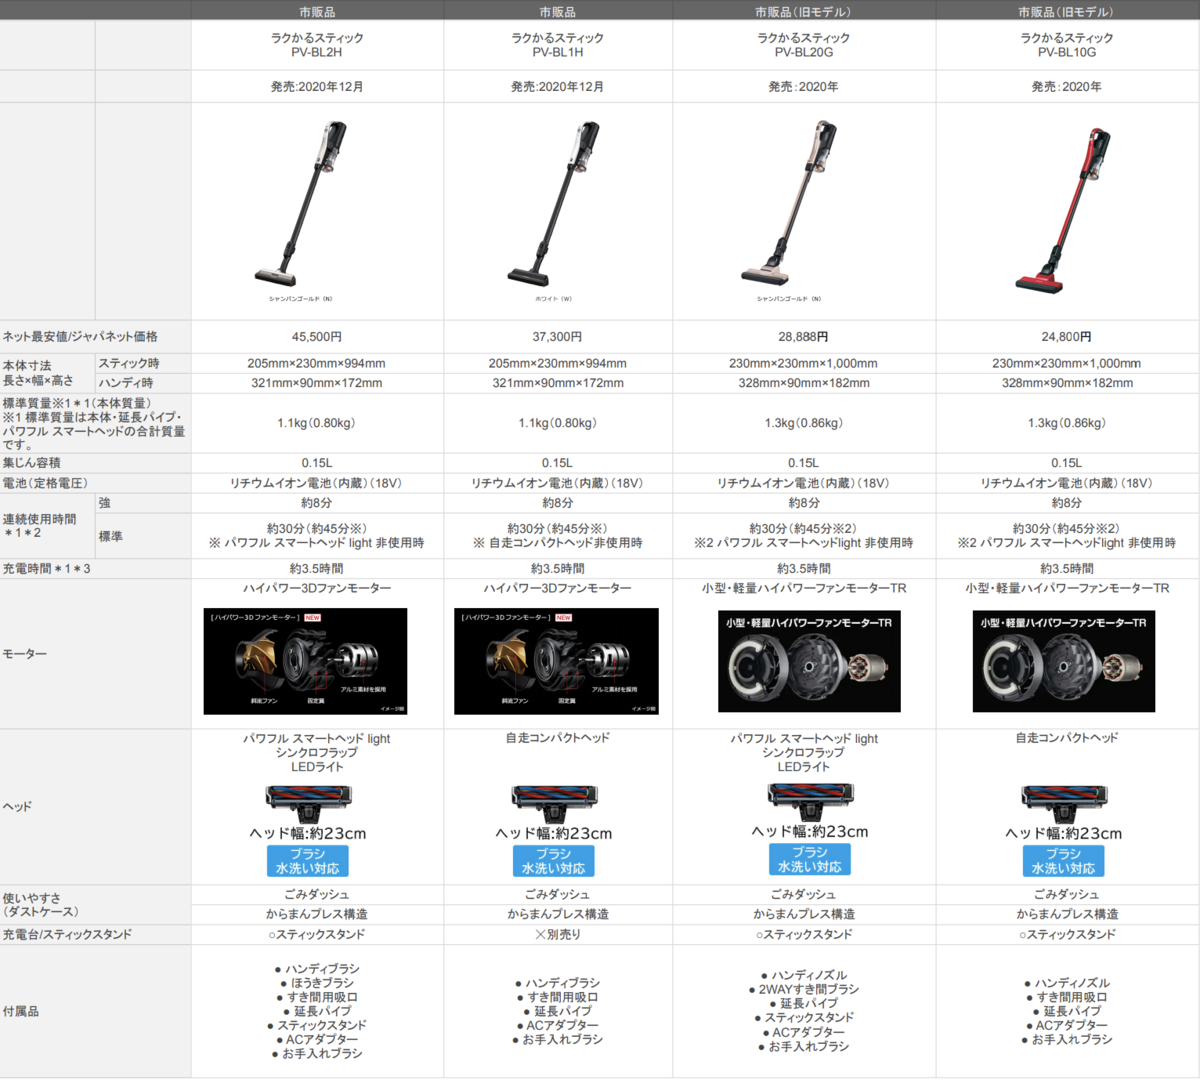 f:id:hardshopper:20210317120731p:plain